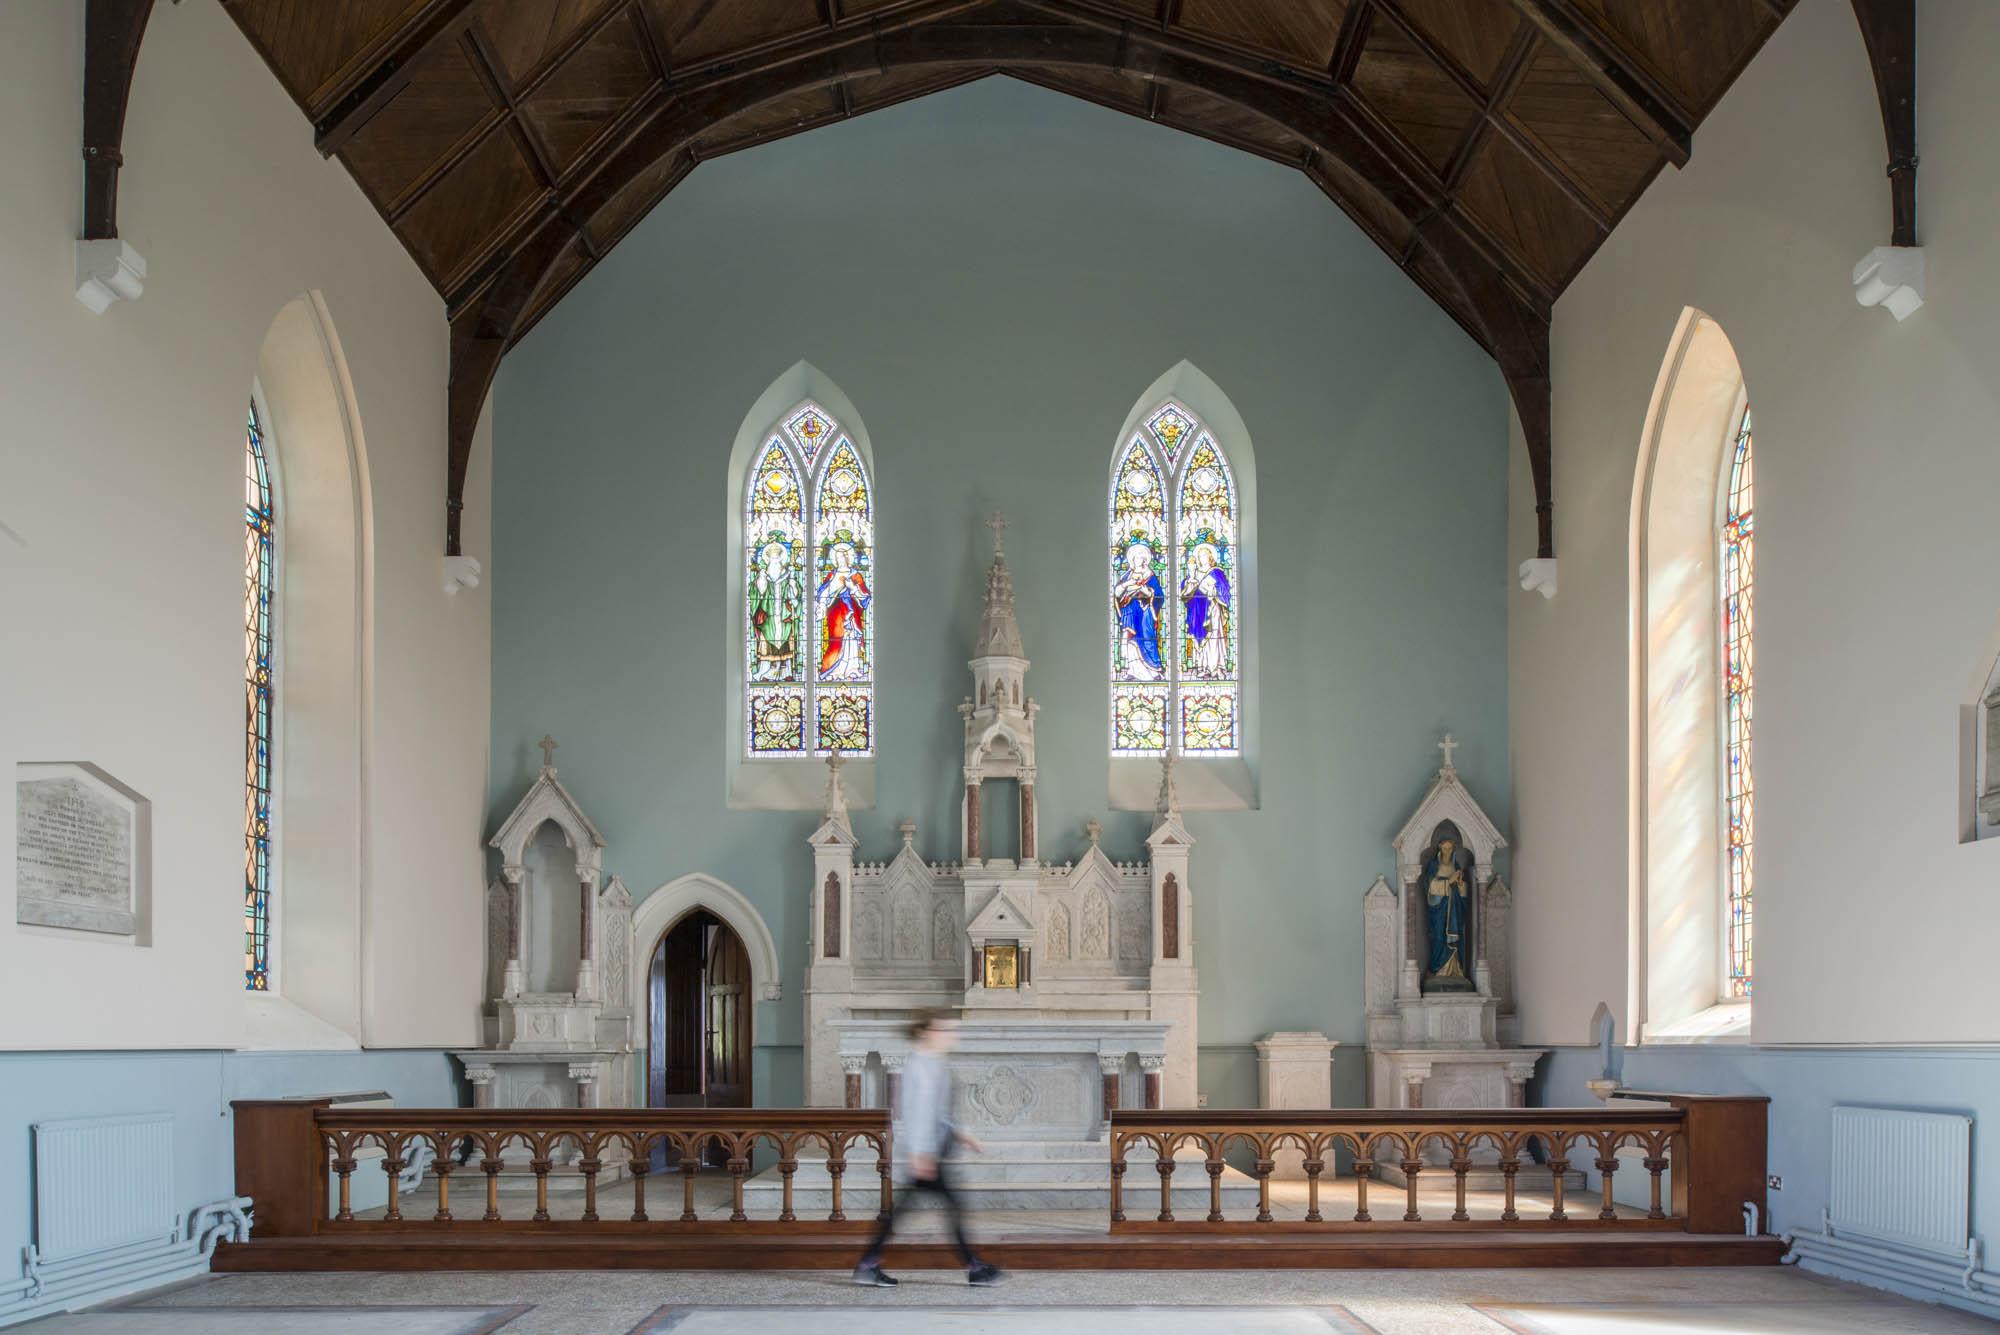 internal image of church